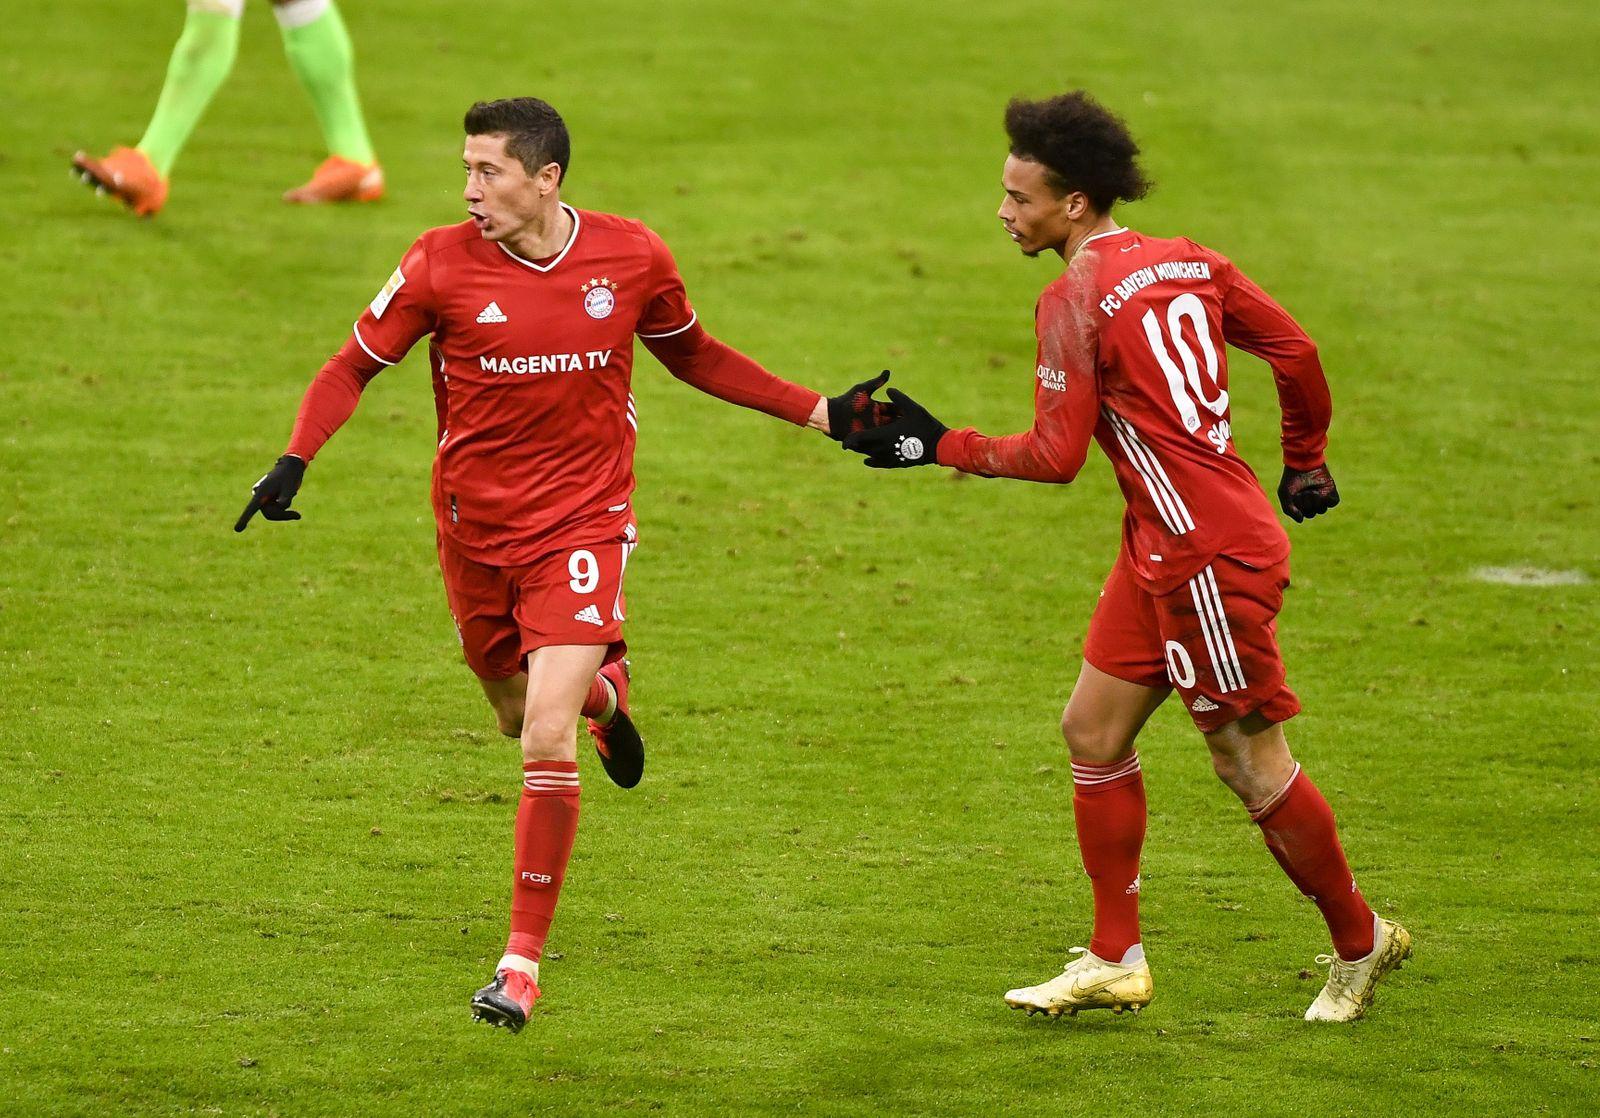 Bayern Munich vs VfL Wolfsburg, Germany - 16 Dec 2020